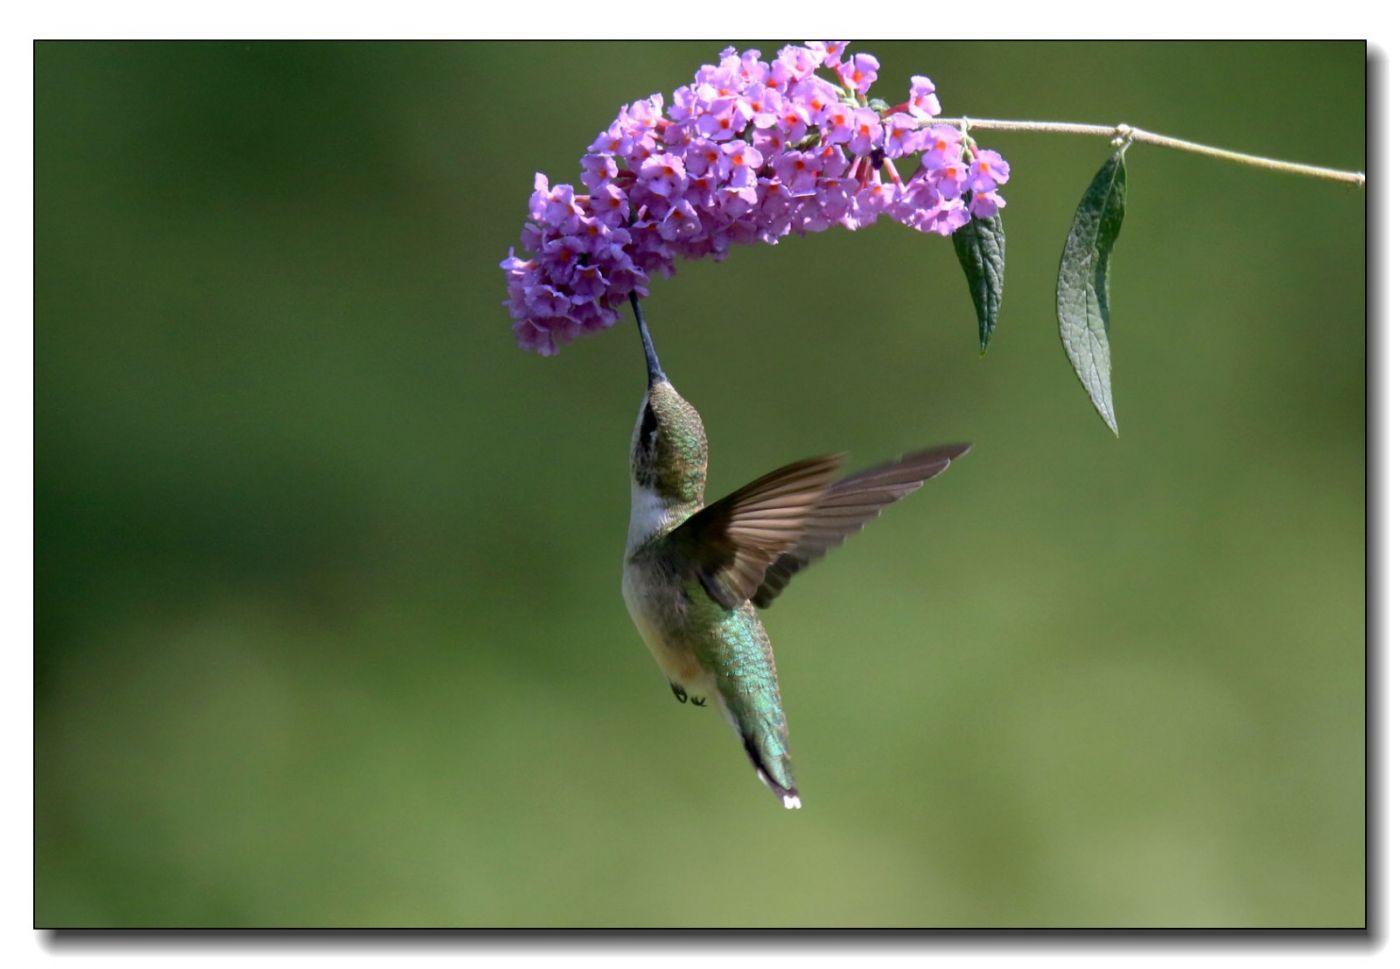 蜂鸟组图(五)_图1-9